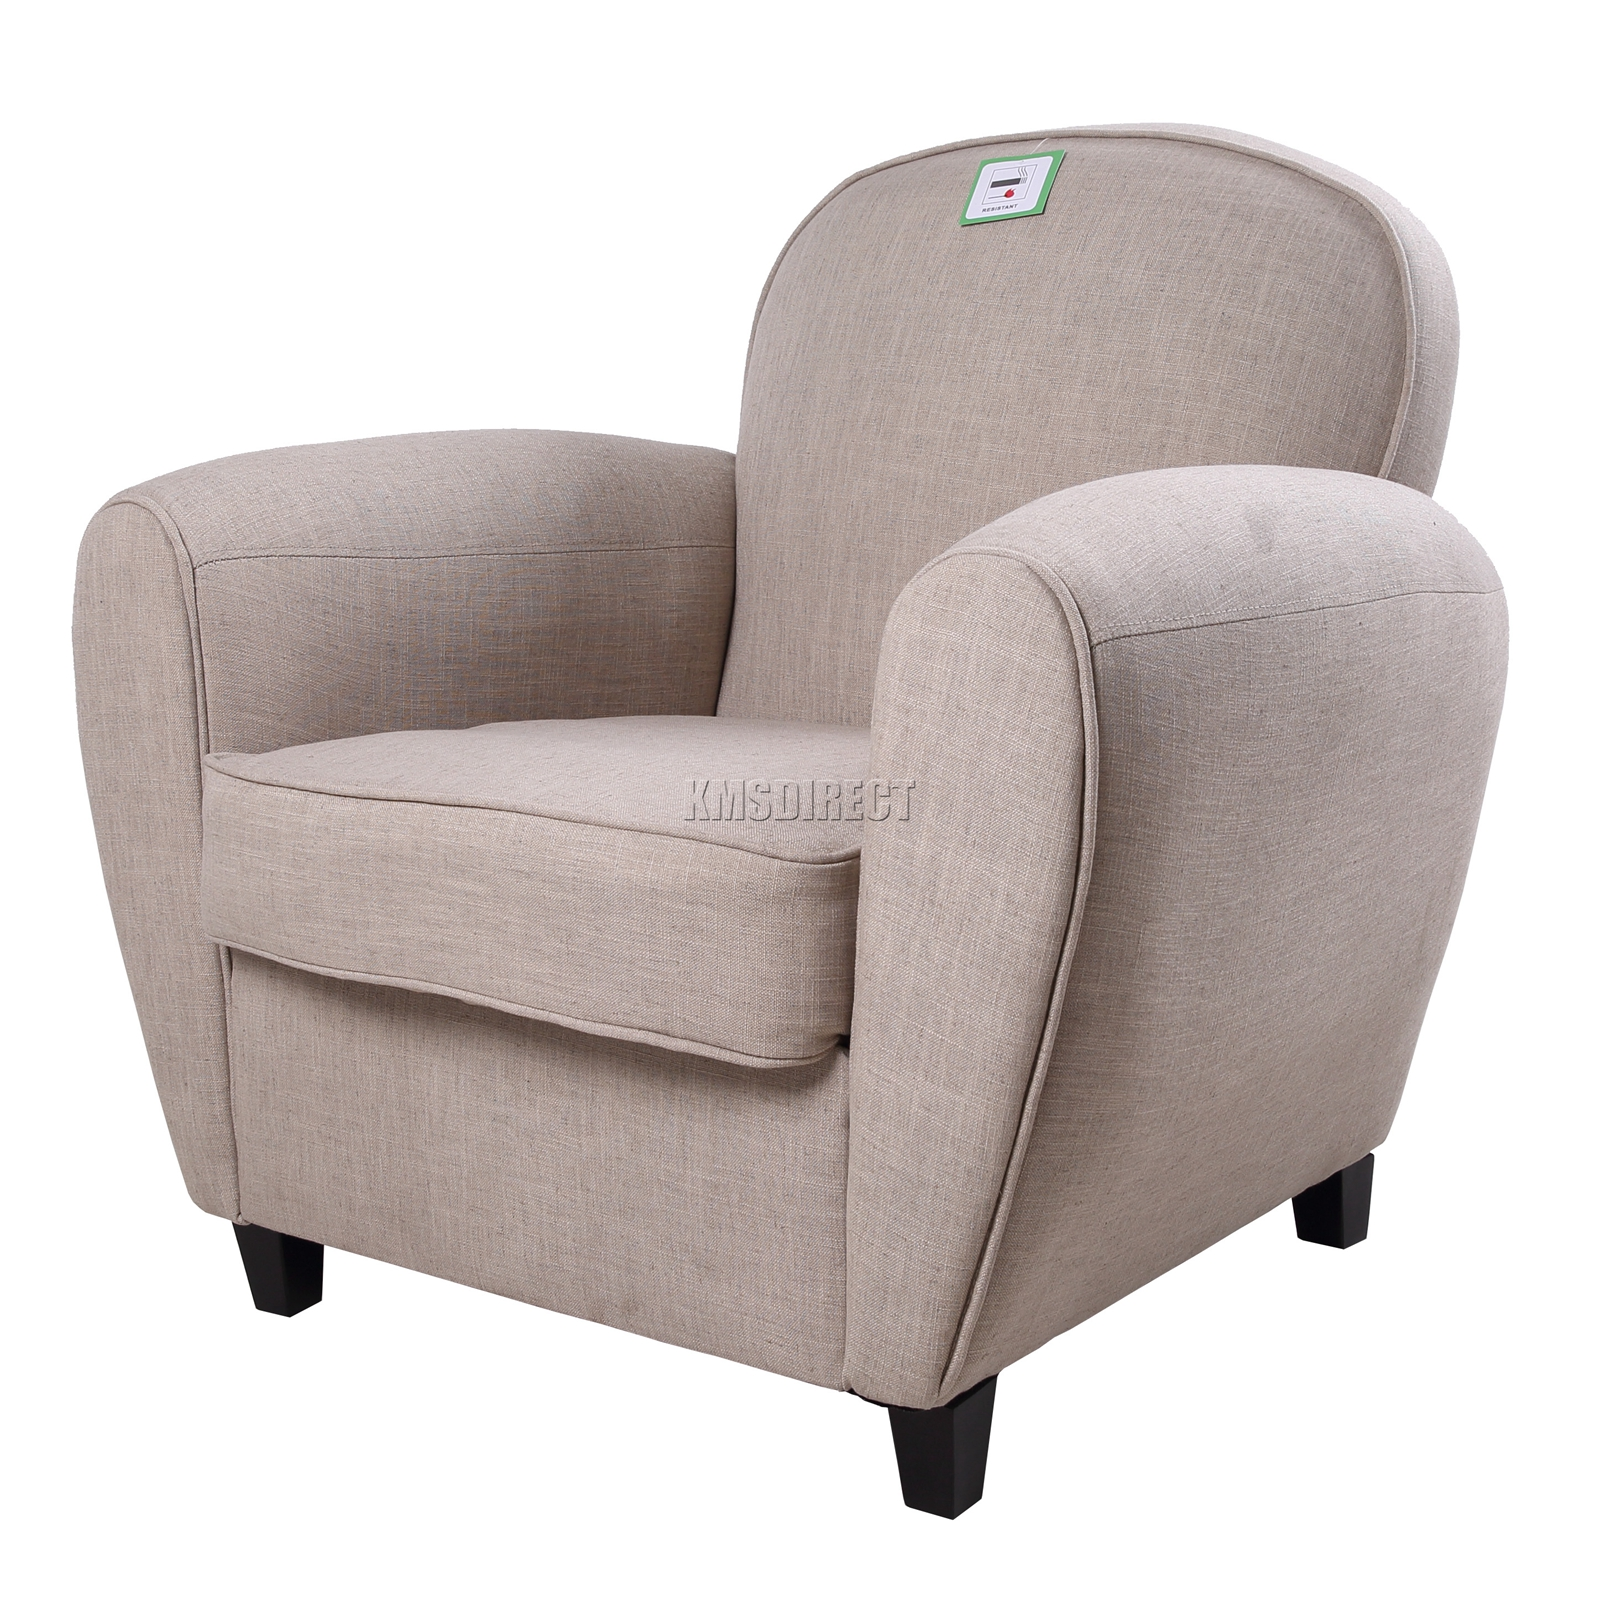 Foxhunter linen fabric tub chair armchair 2094 sofa dining for Cream armchair